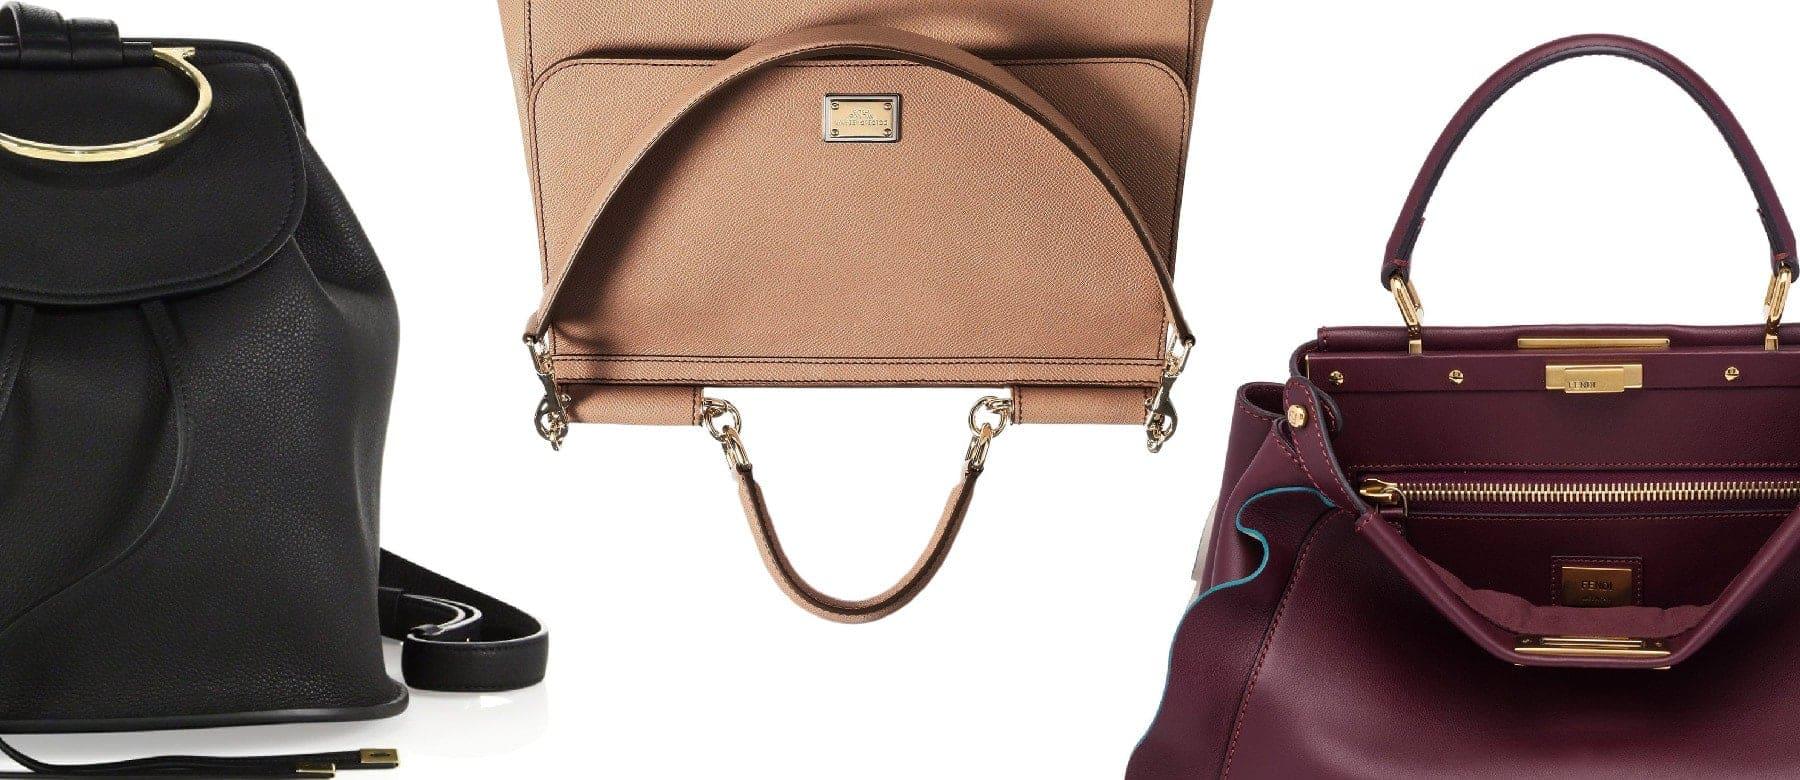 Best Fall Bags